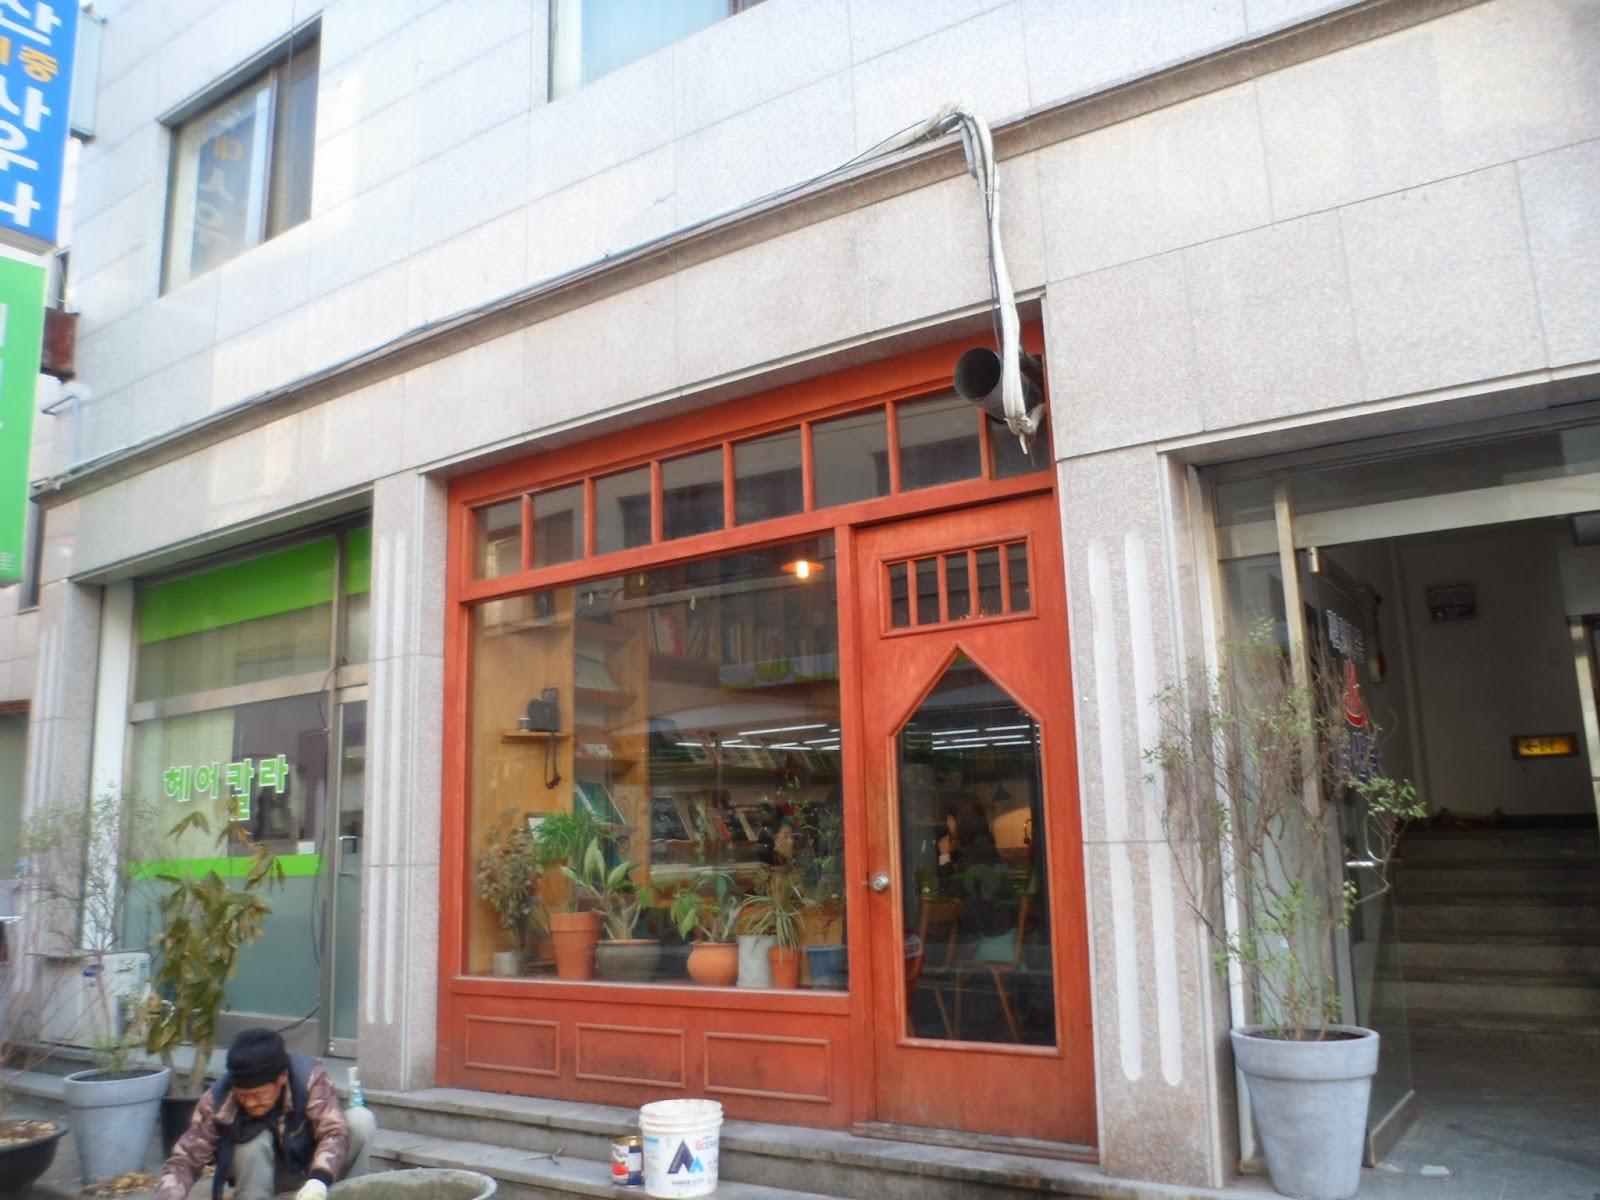 changs kitchen chang jinwoo sikdang - Changs Kitchen